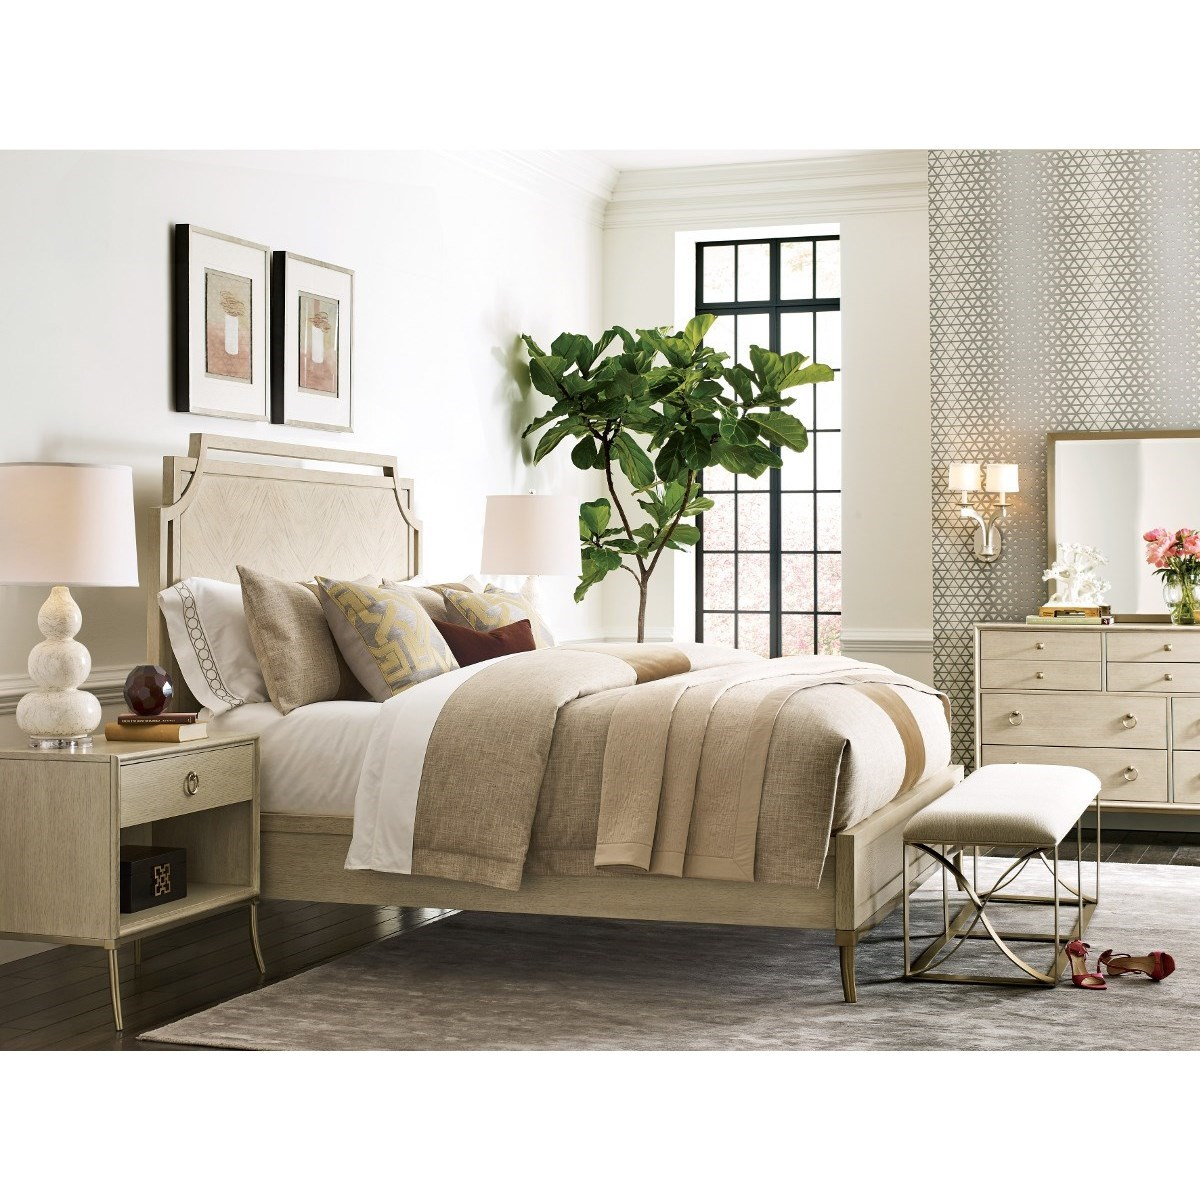 Lenox King Bedroom Group by American Drew at Stoney Creek Furniture